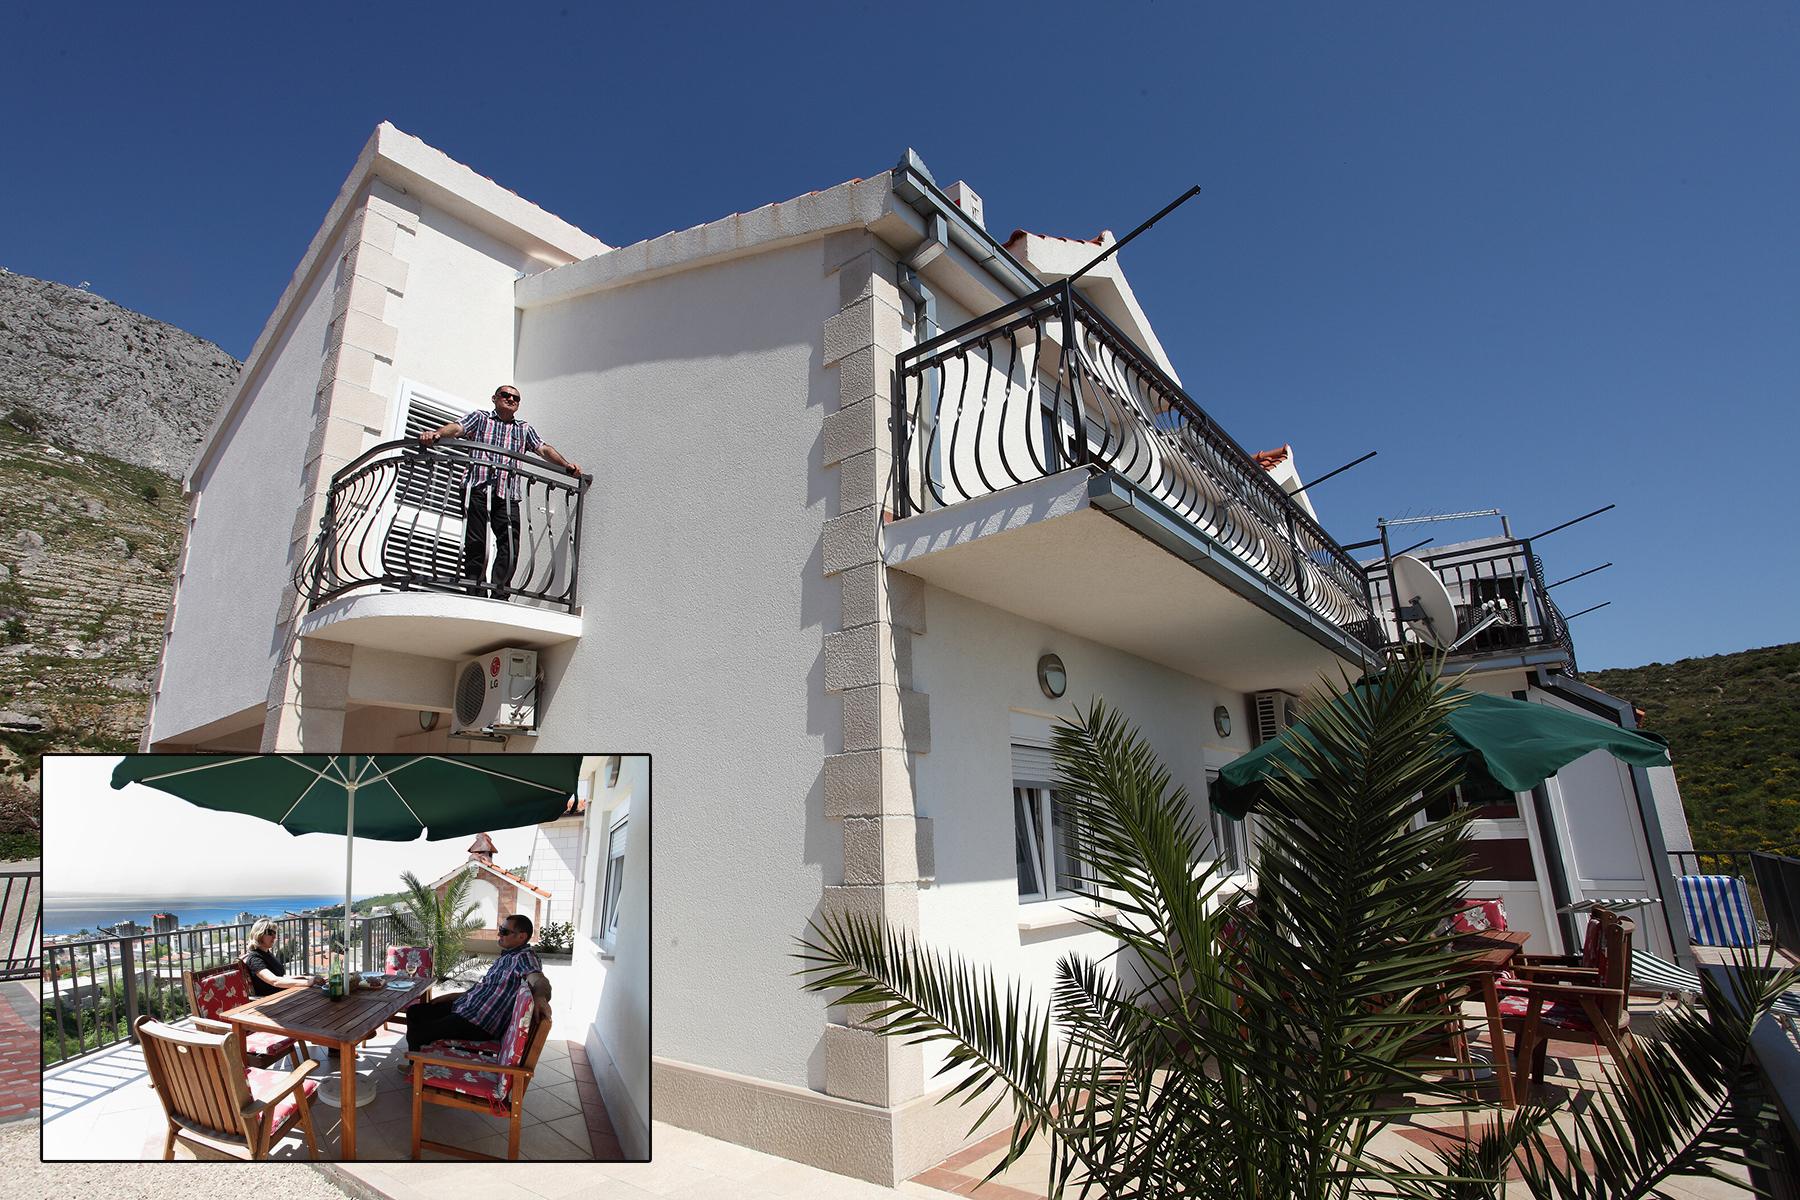 36395 - Dugi Rat - Appartamenti Croazia